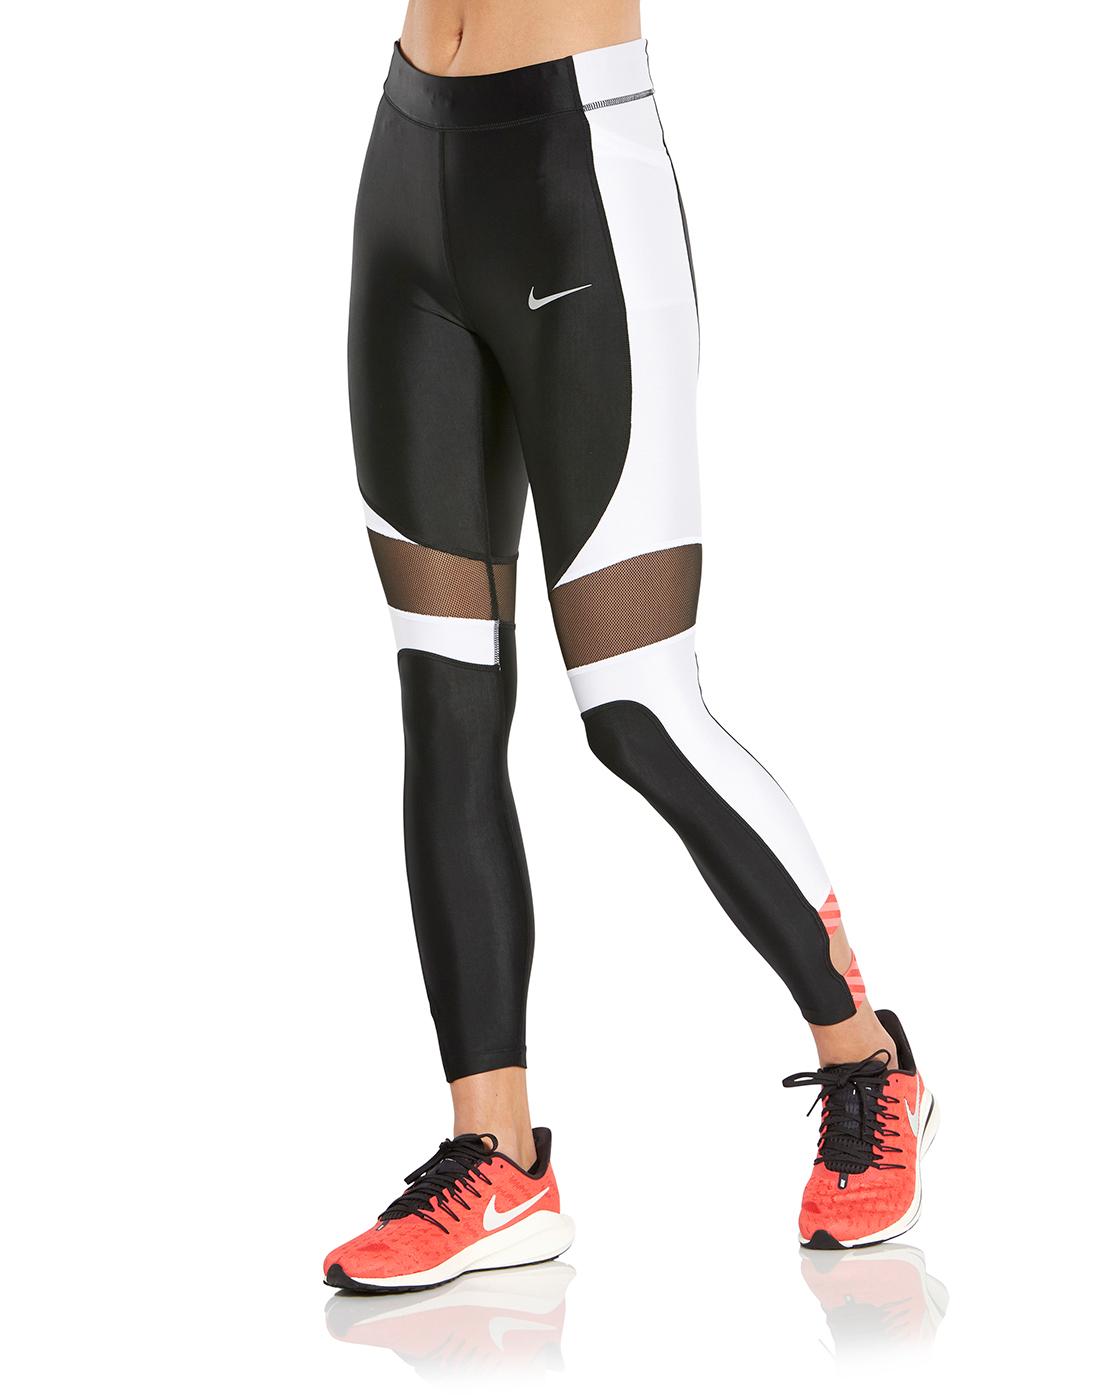 e5f093acb4794 Women s Black Nike Cropped Tights